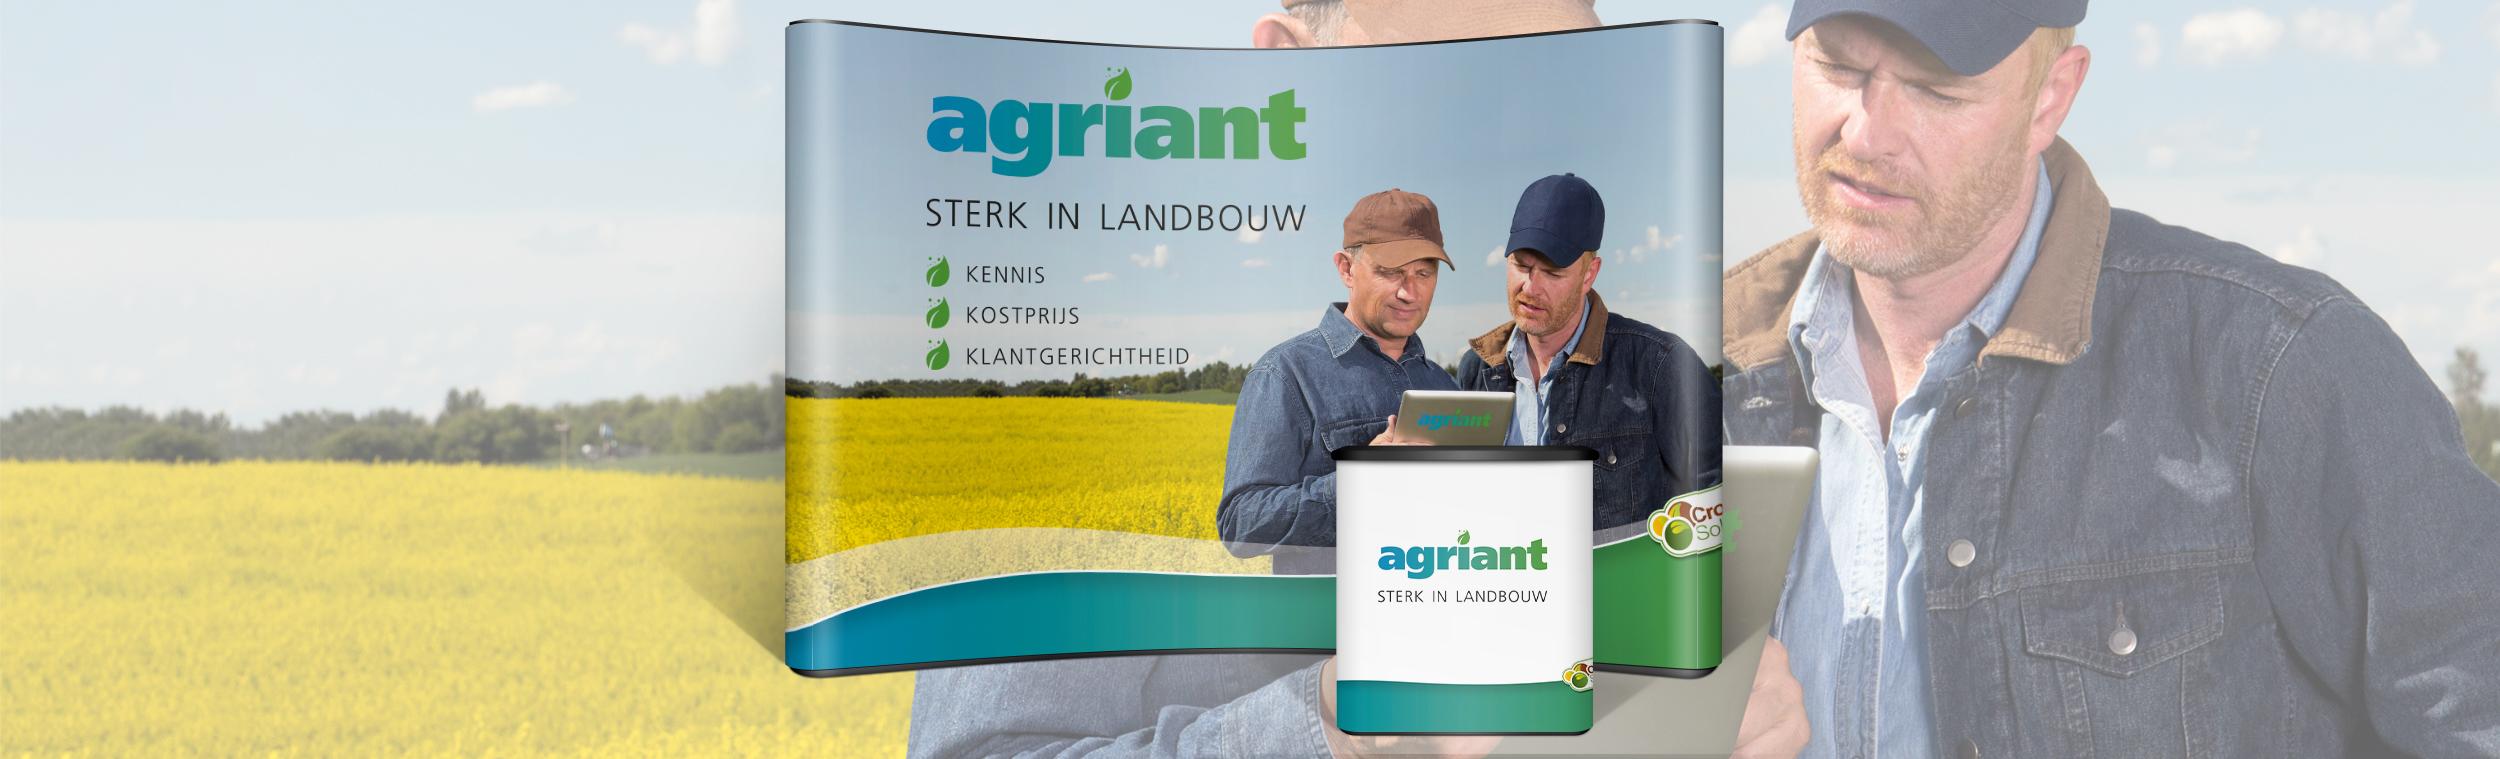 portfolio-agriant-beurswand